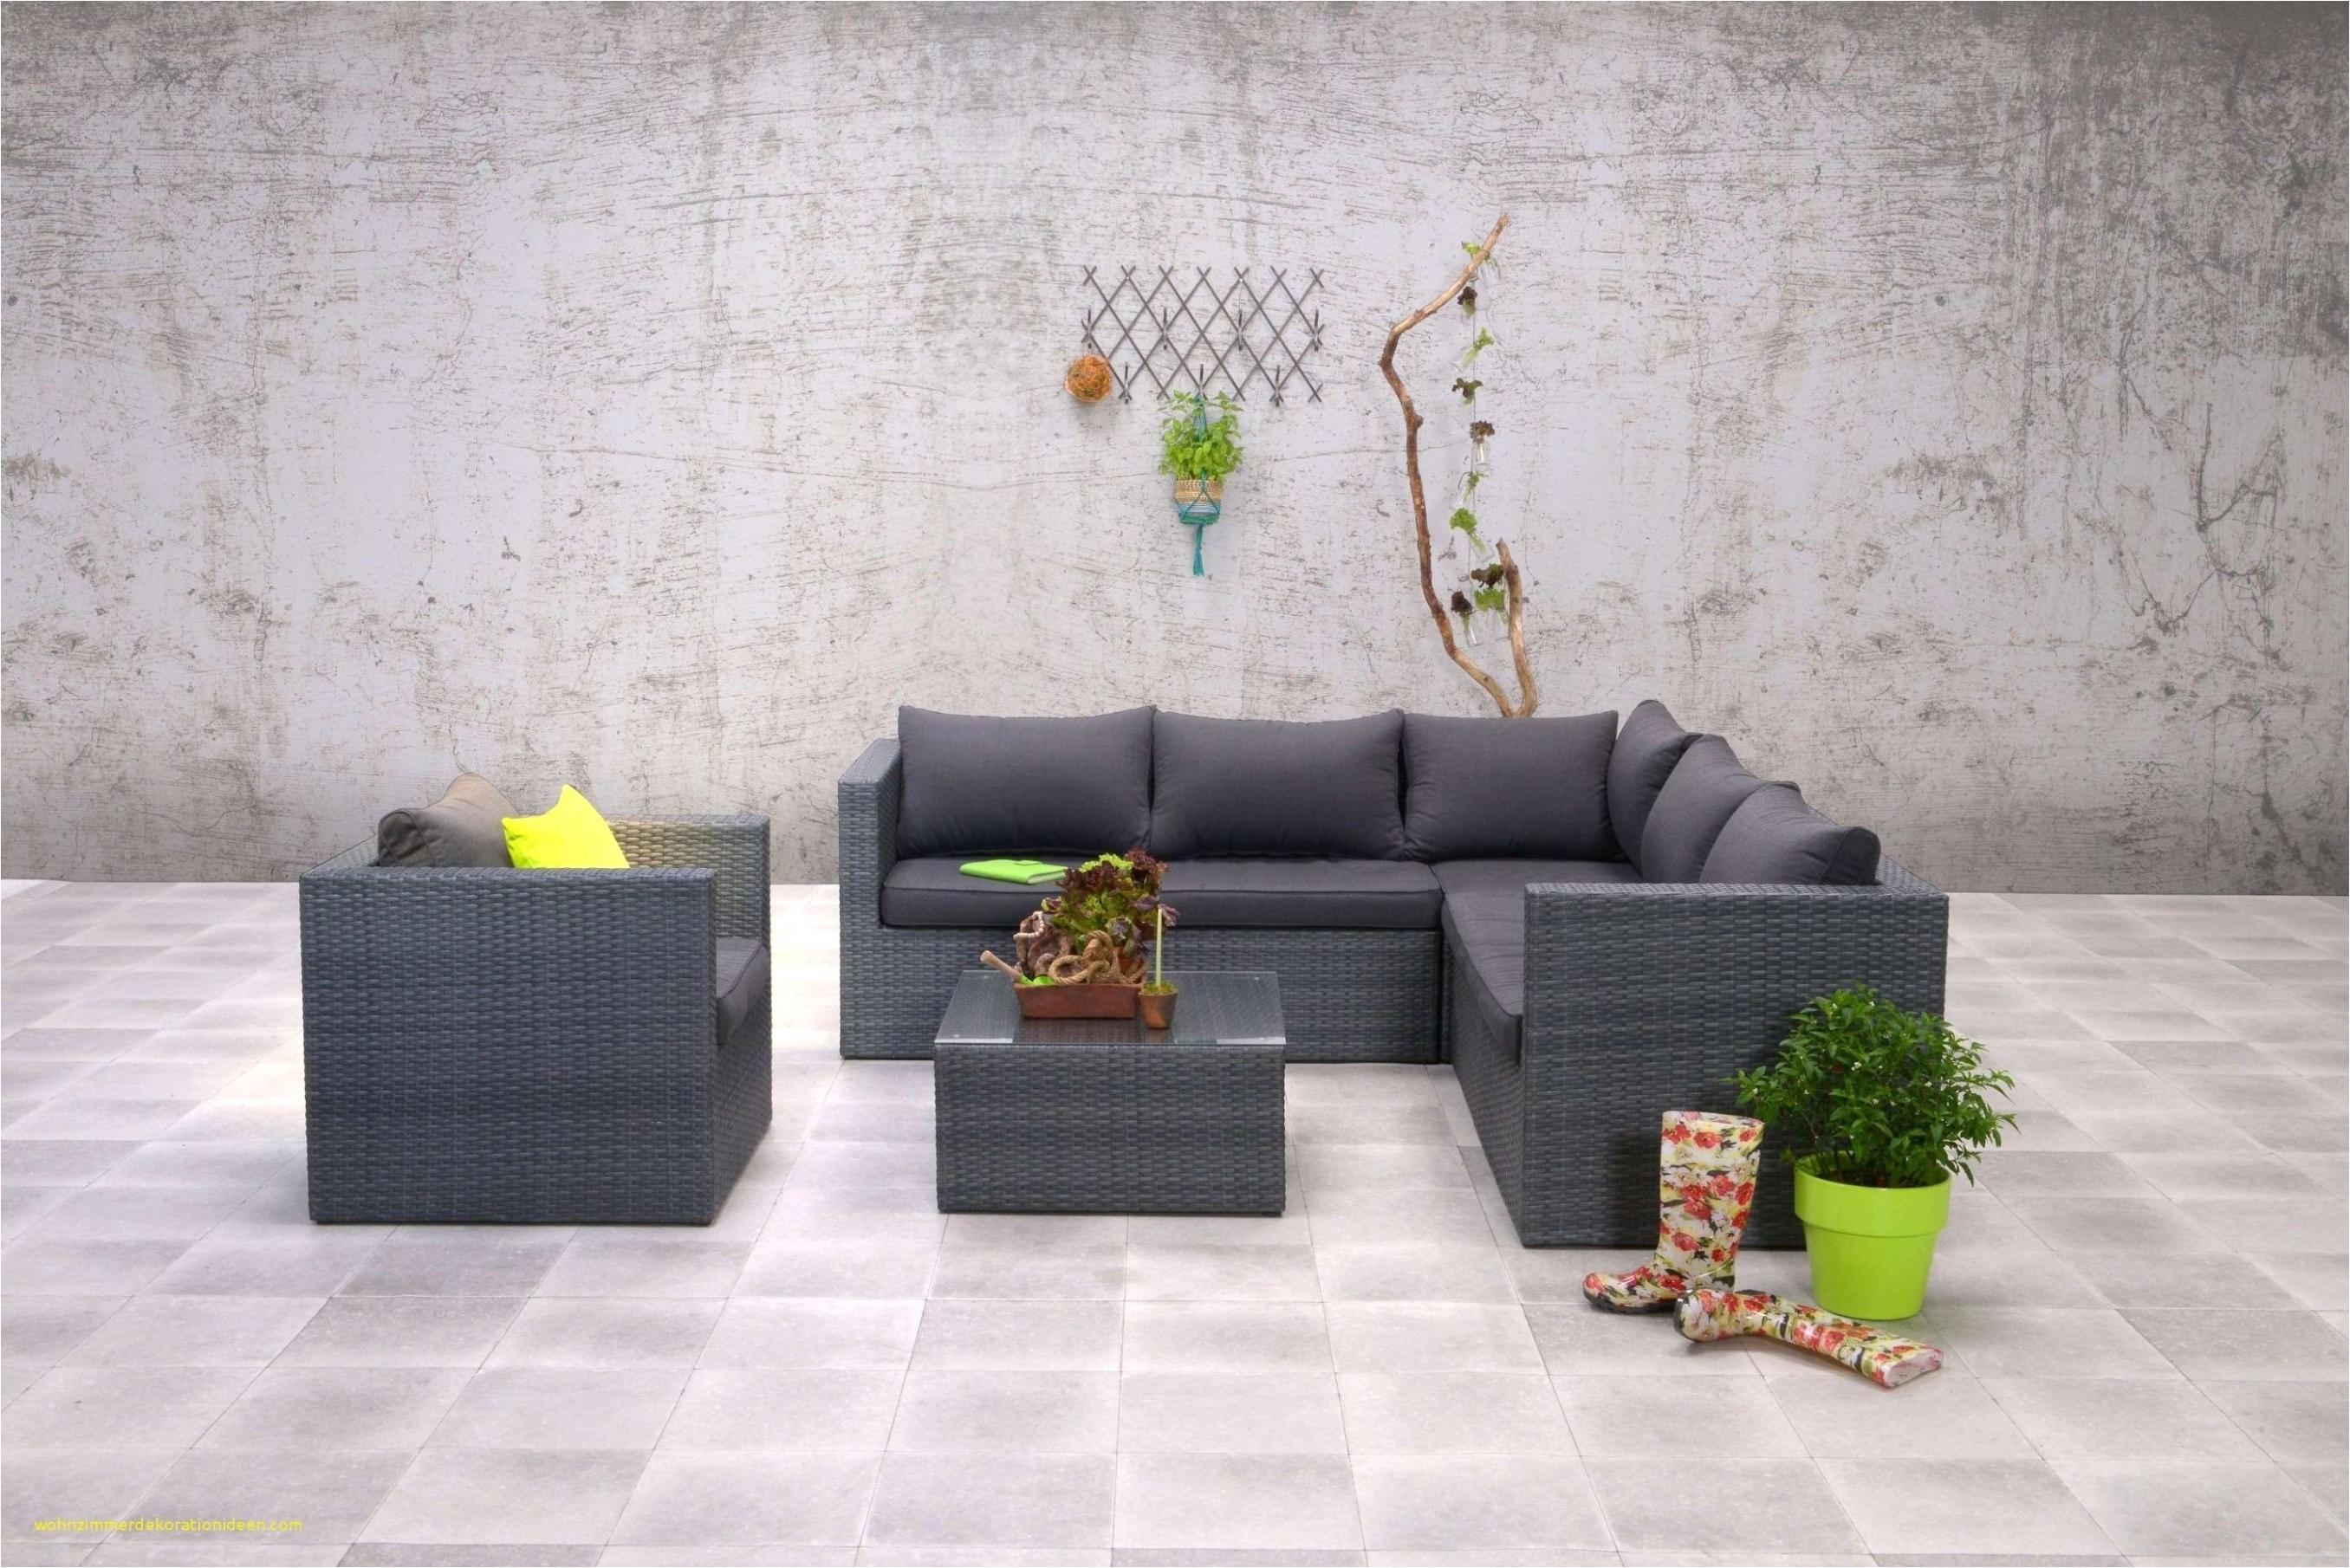 image of schlafsofa modern design luxus schlafsofa modern 0d galerie